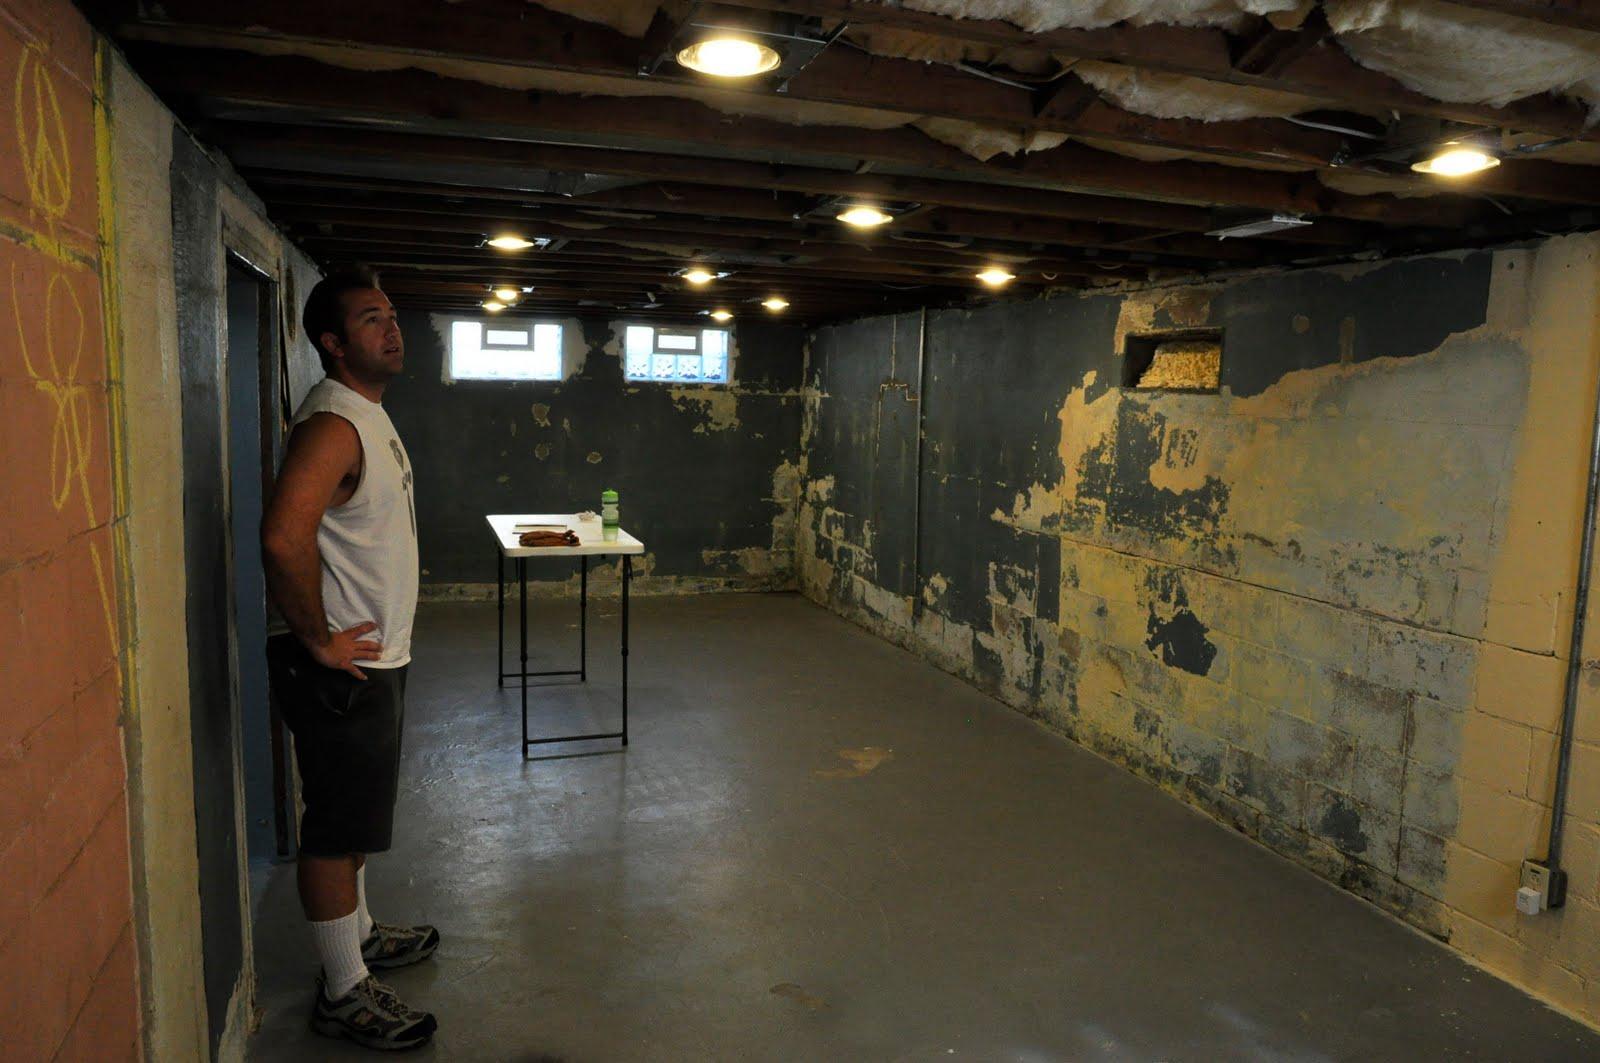 Basement Lighting Recessed Ceiling: Fromthefieryfurnace: Basement Reno